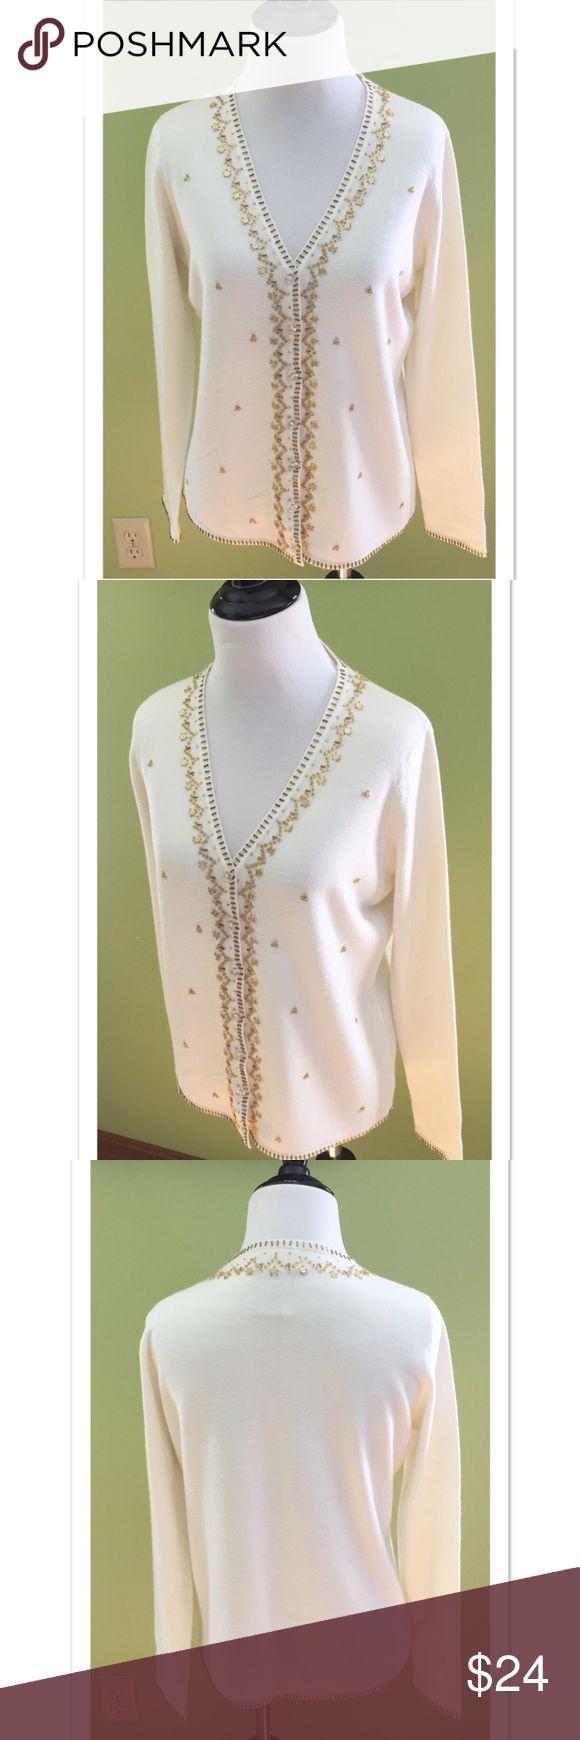 Selling this Designers Originals Gold bead + sequin  Cardigan on Poshmark! My username is: davias_closet. #shopmycloset #poshmark #fashion #shopping #style #forsale #Designers Originals #Sweaters